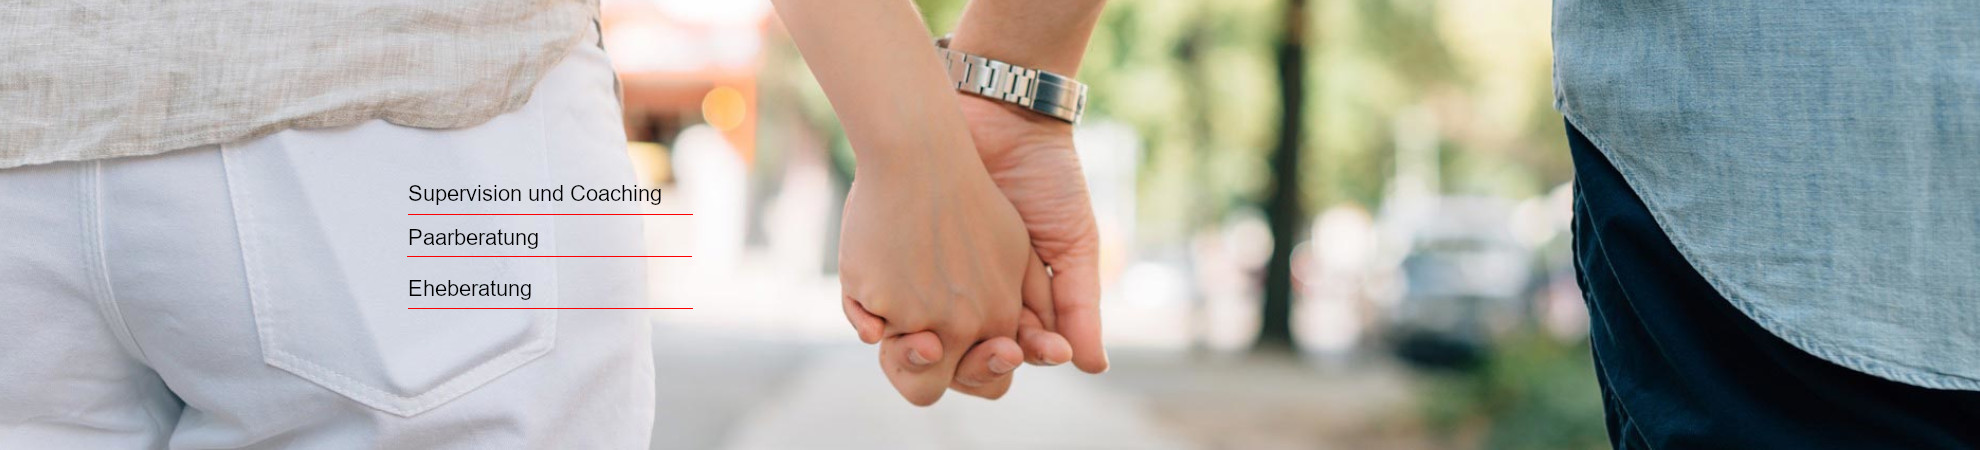 Supervision und Coaching | Eheberatung | Paarberatung | Stuttgart